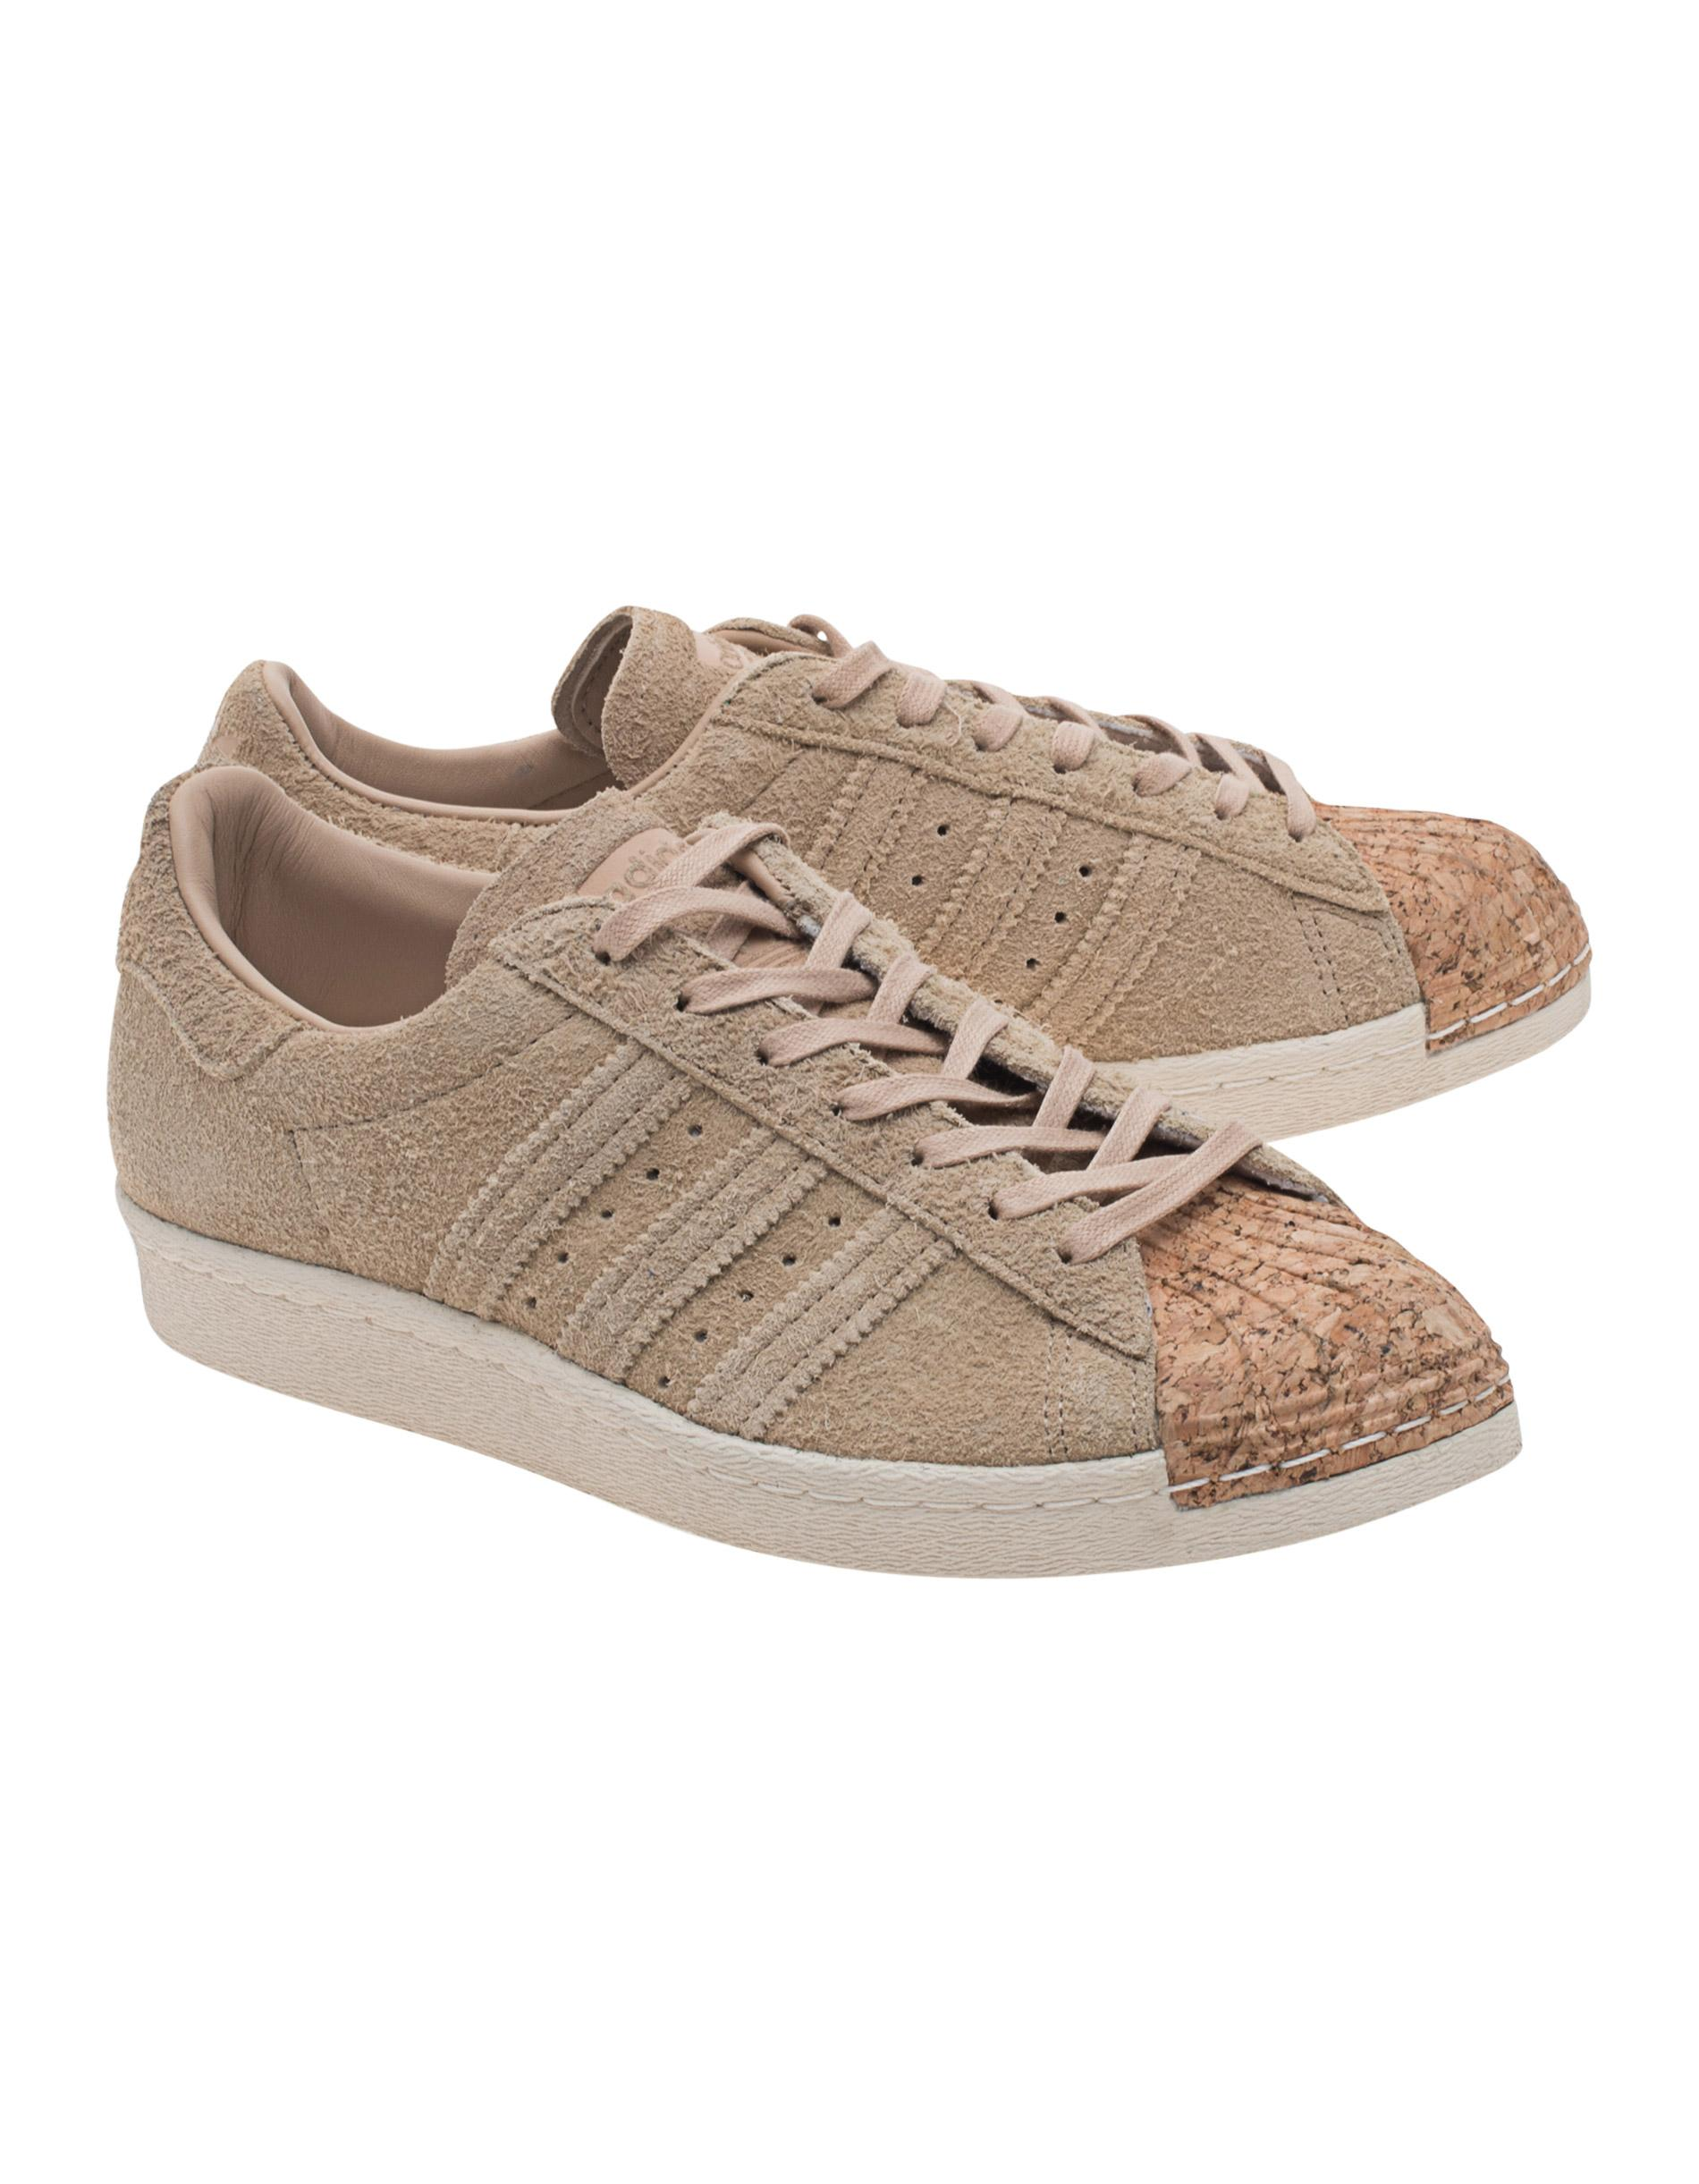 Adidas Superstar Kork